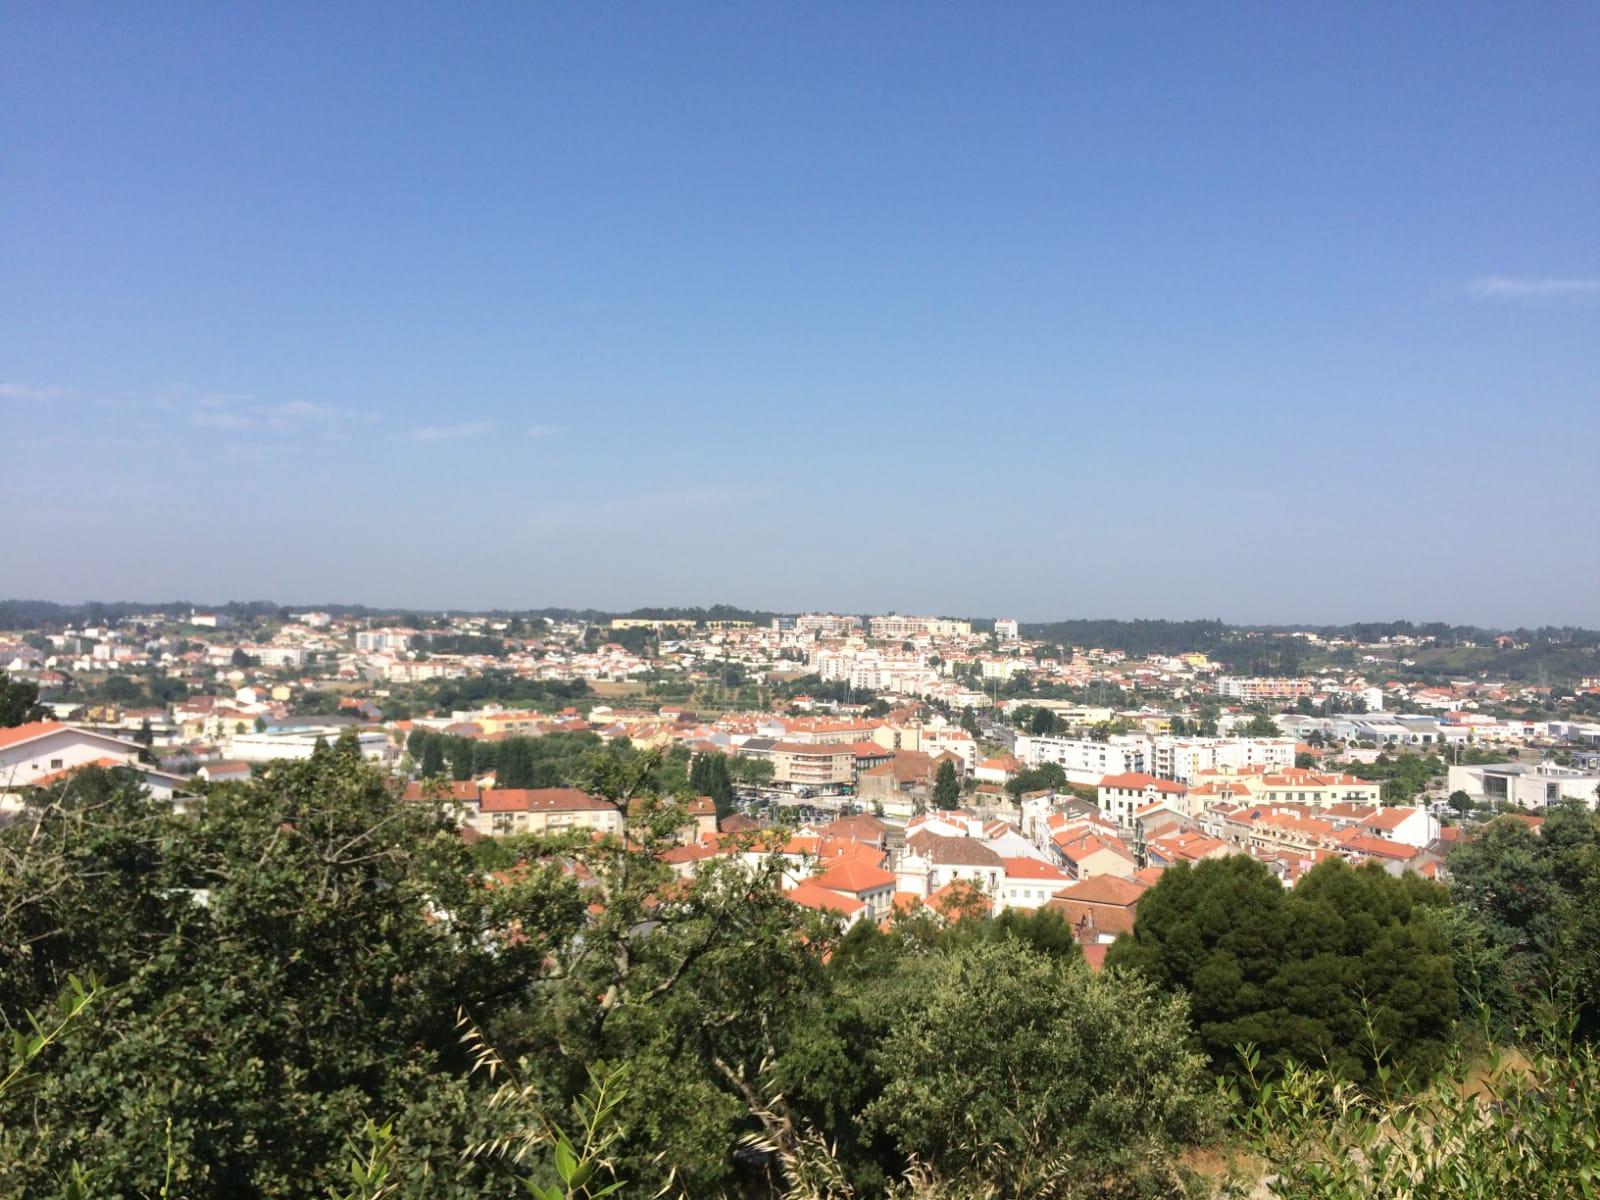 visiter-panorama-ville-de-ansiao-rois-de-portugal-tourisme